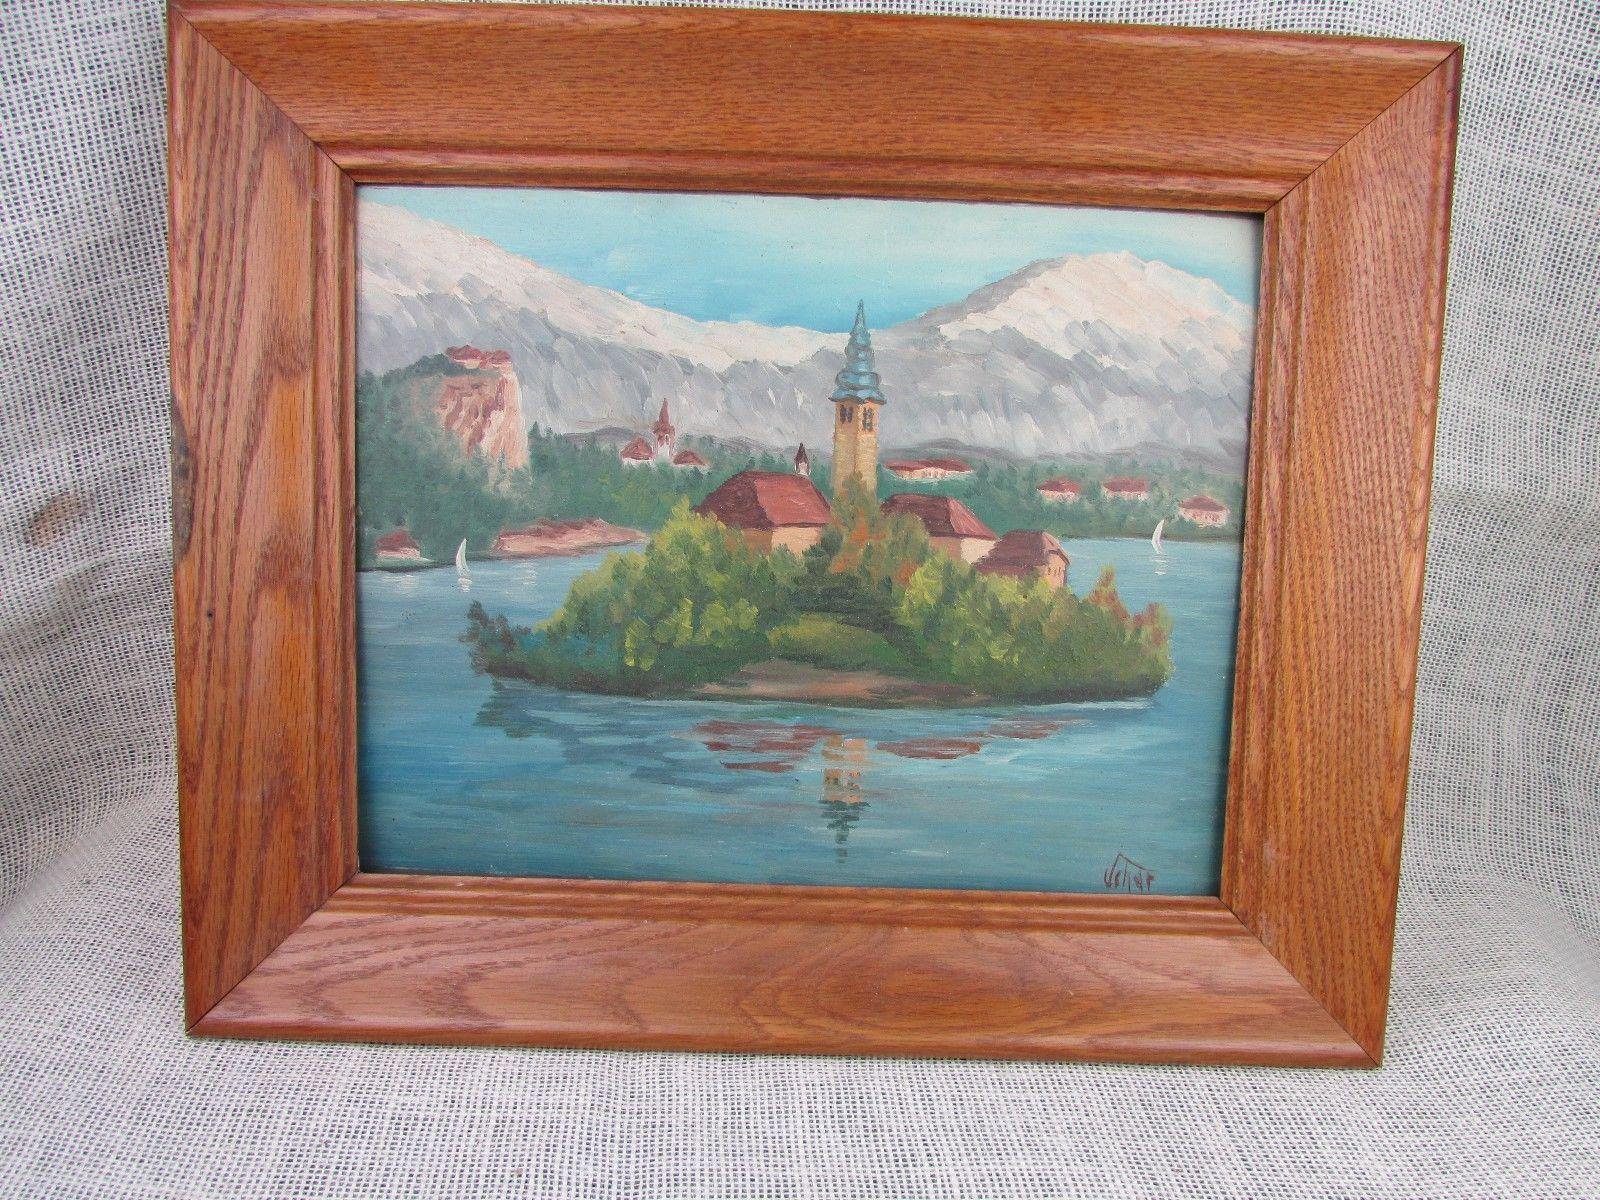 "Original oil on board painting Lake Bled Slovenia - Artist signed 11""x14"" https://t.co/e50fDZQmLd #Homedecor https://t.co/16RgwaJlGe"